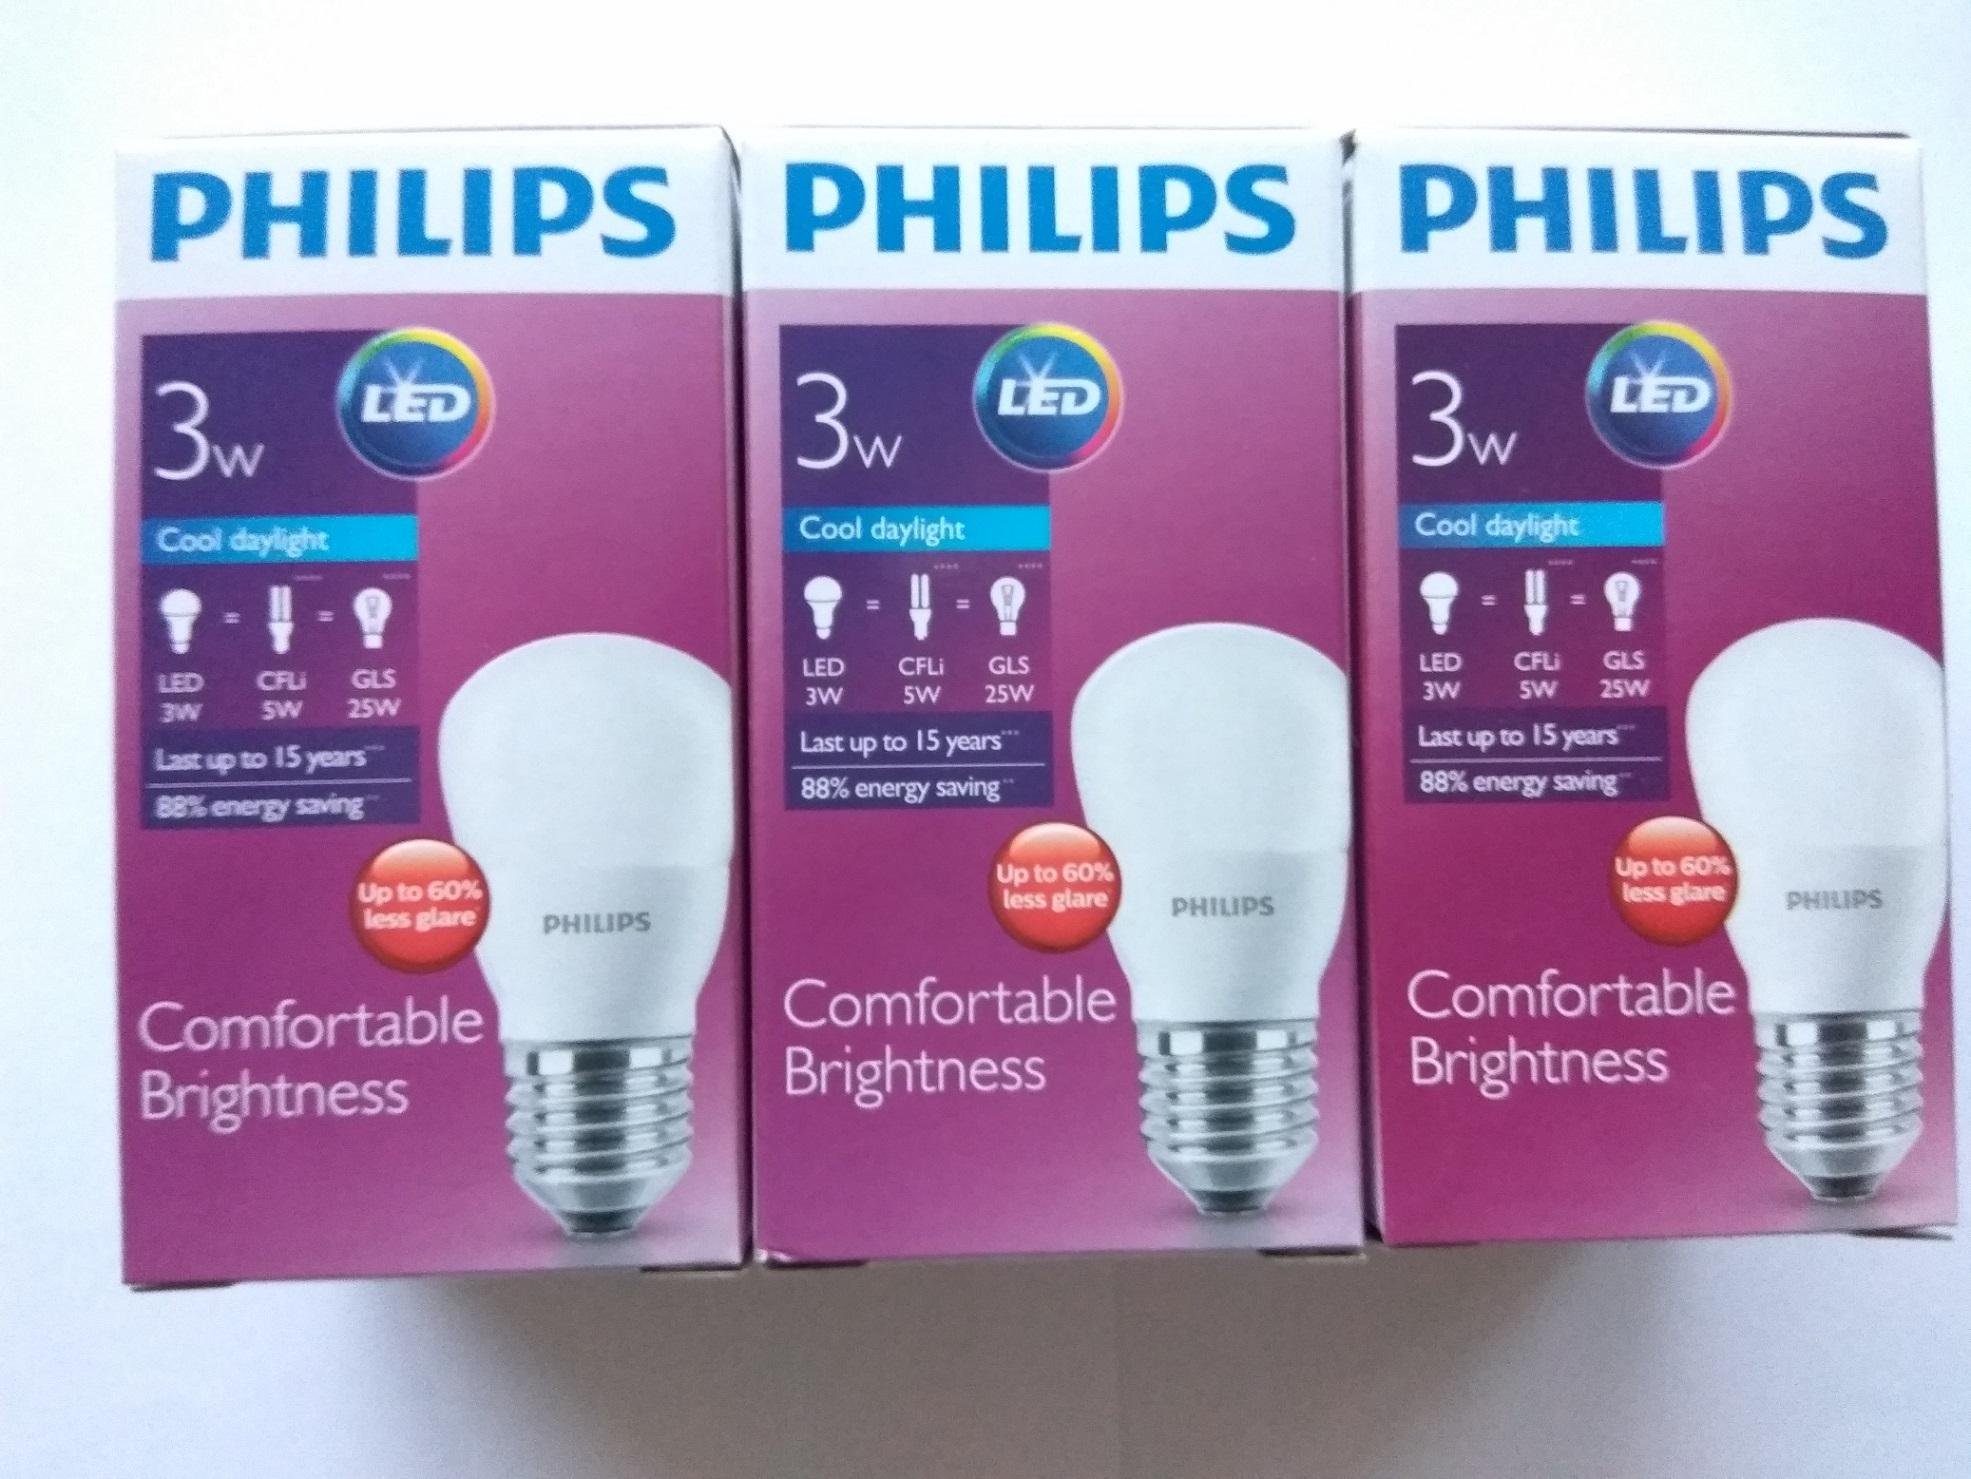 Paket Philips Lampu LED 3w 3pcs - White